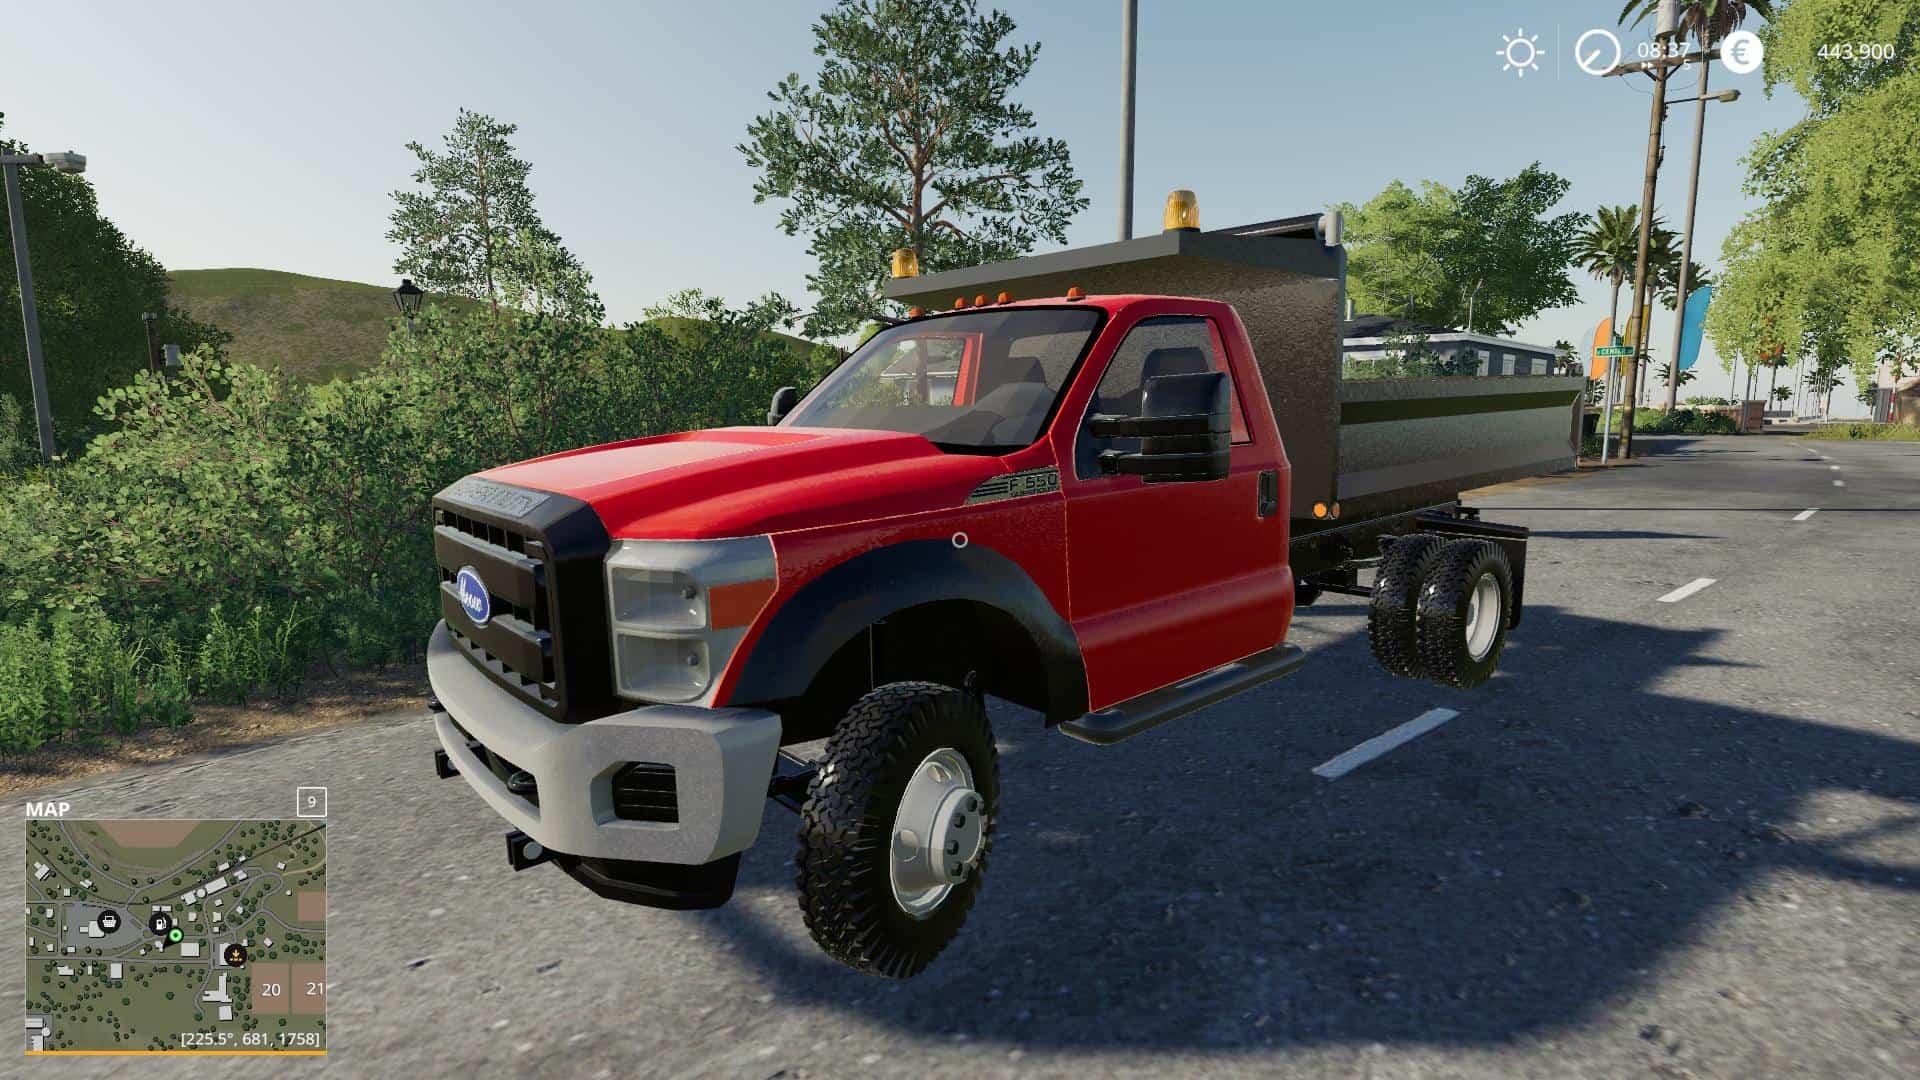 F550 dump truck v1 0 Mod - Farming Simulator 19 Mod / FS19